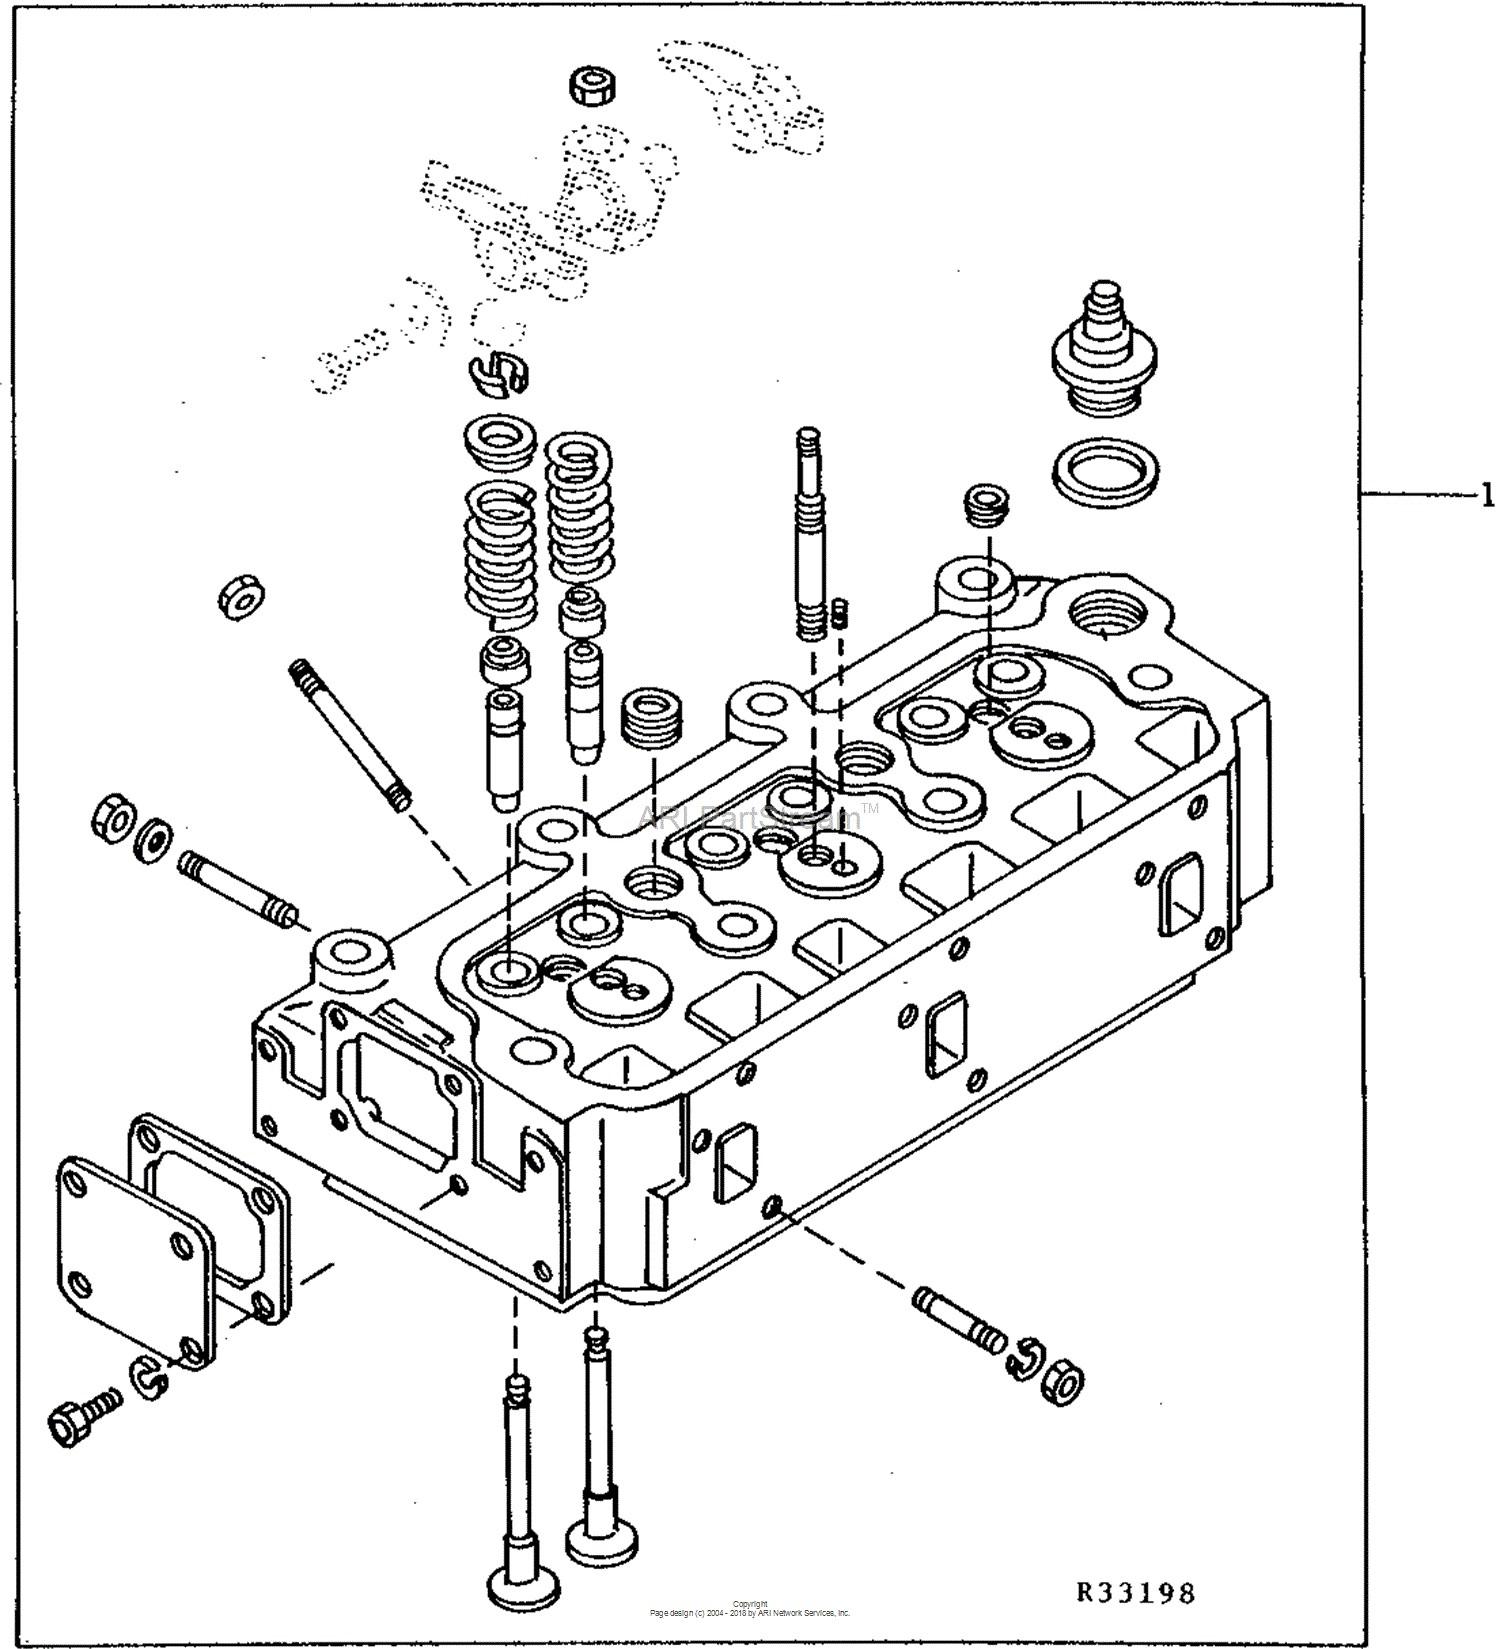 john deere wiring diagram l100 dodge neon speaker tractor engine parts diagrams